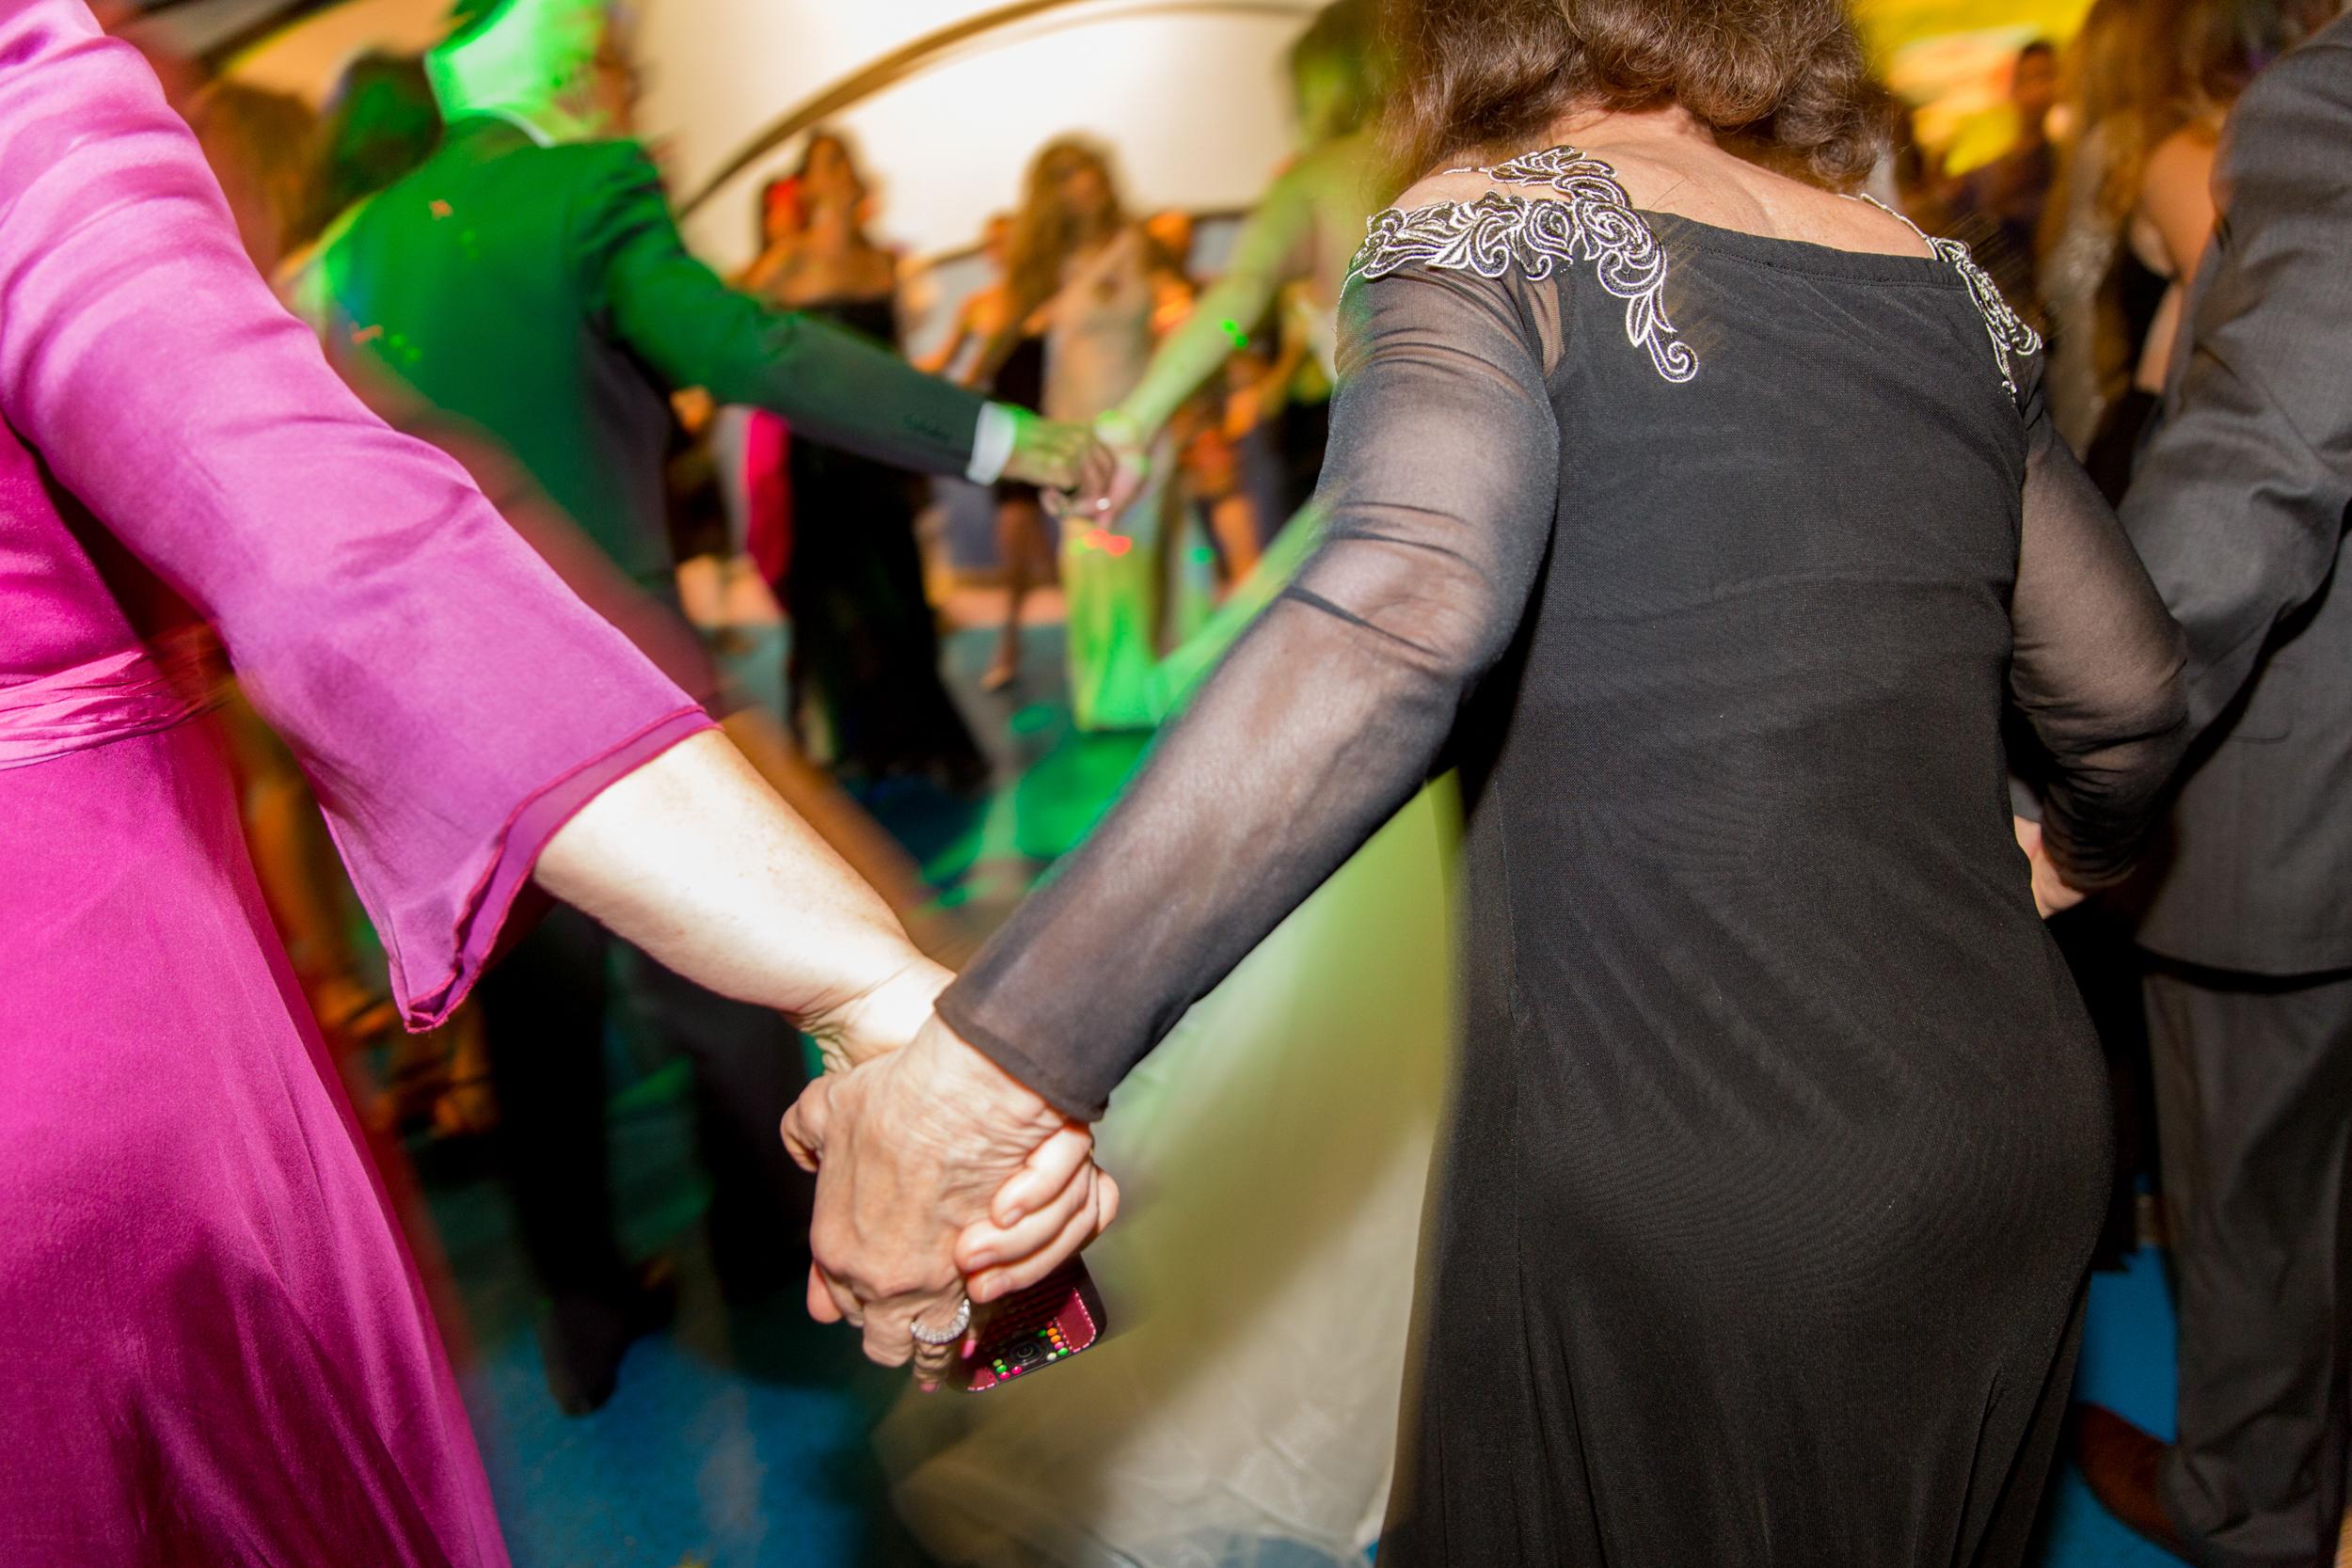 WEB_6-18-17_MindyChris_Wedding-838.jpg